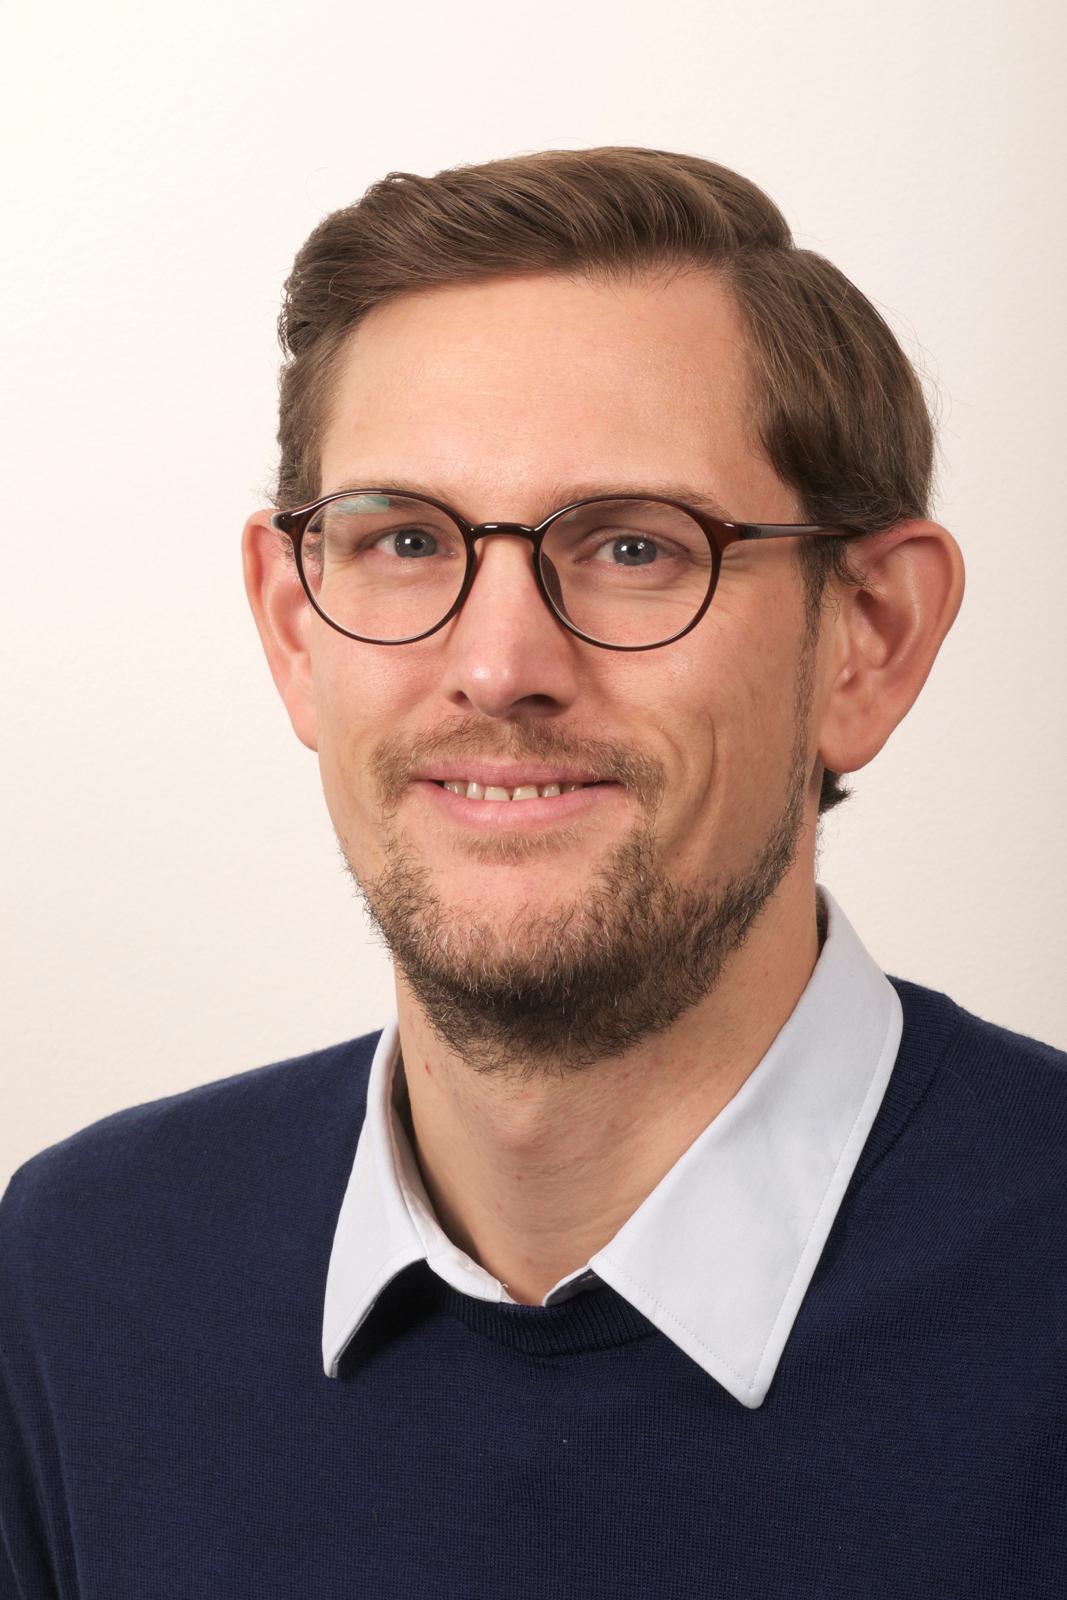 Jens Jungblut